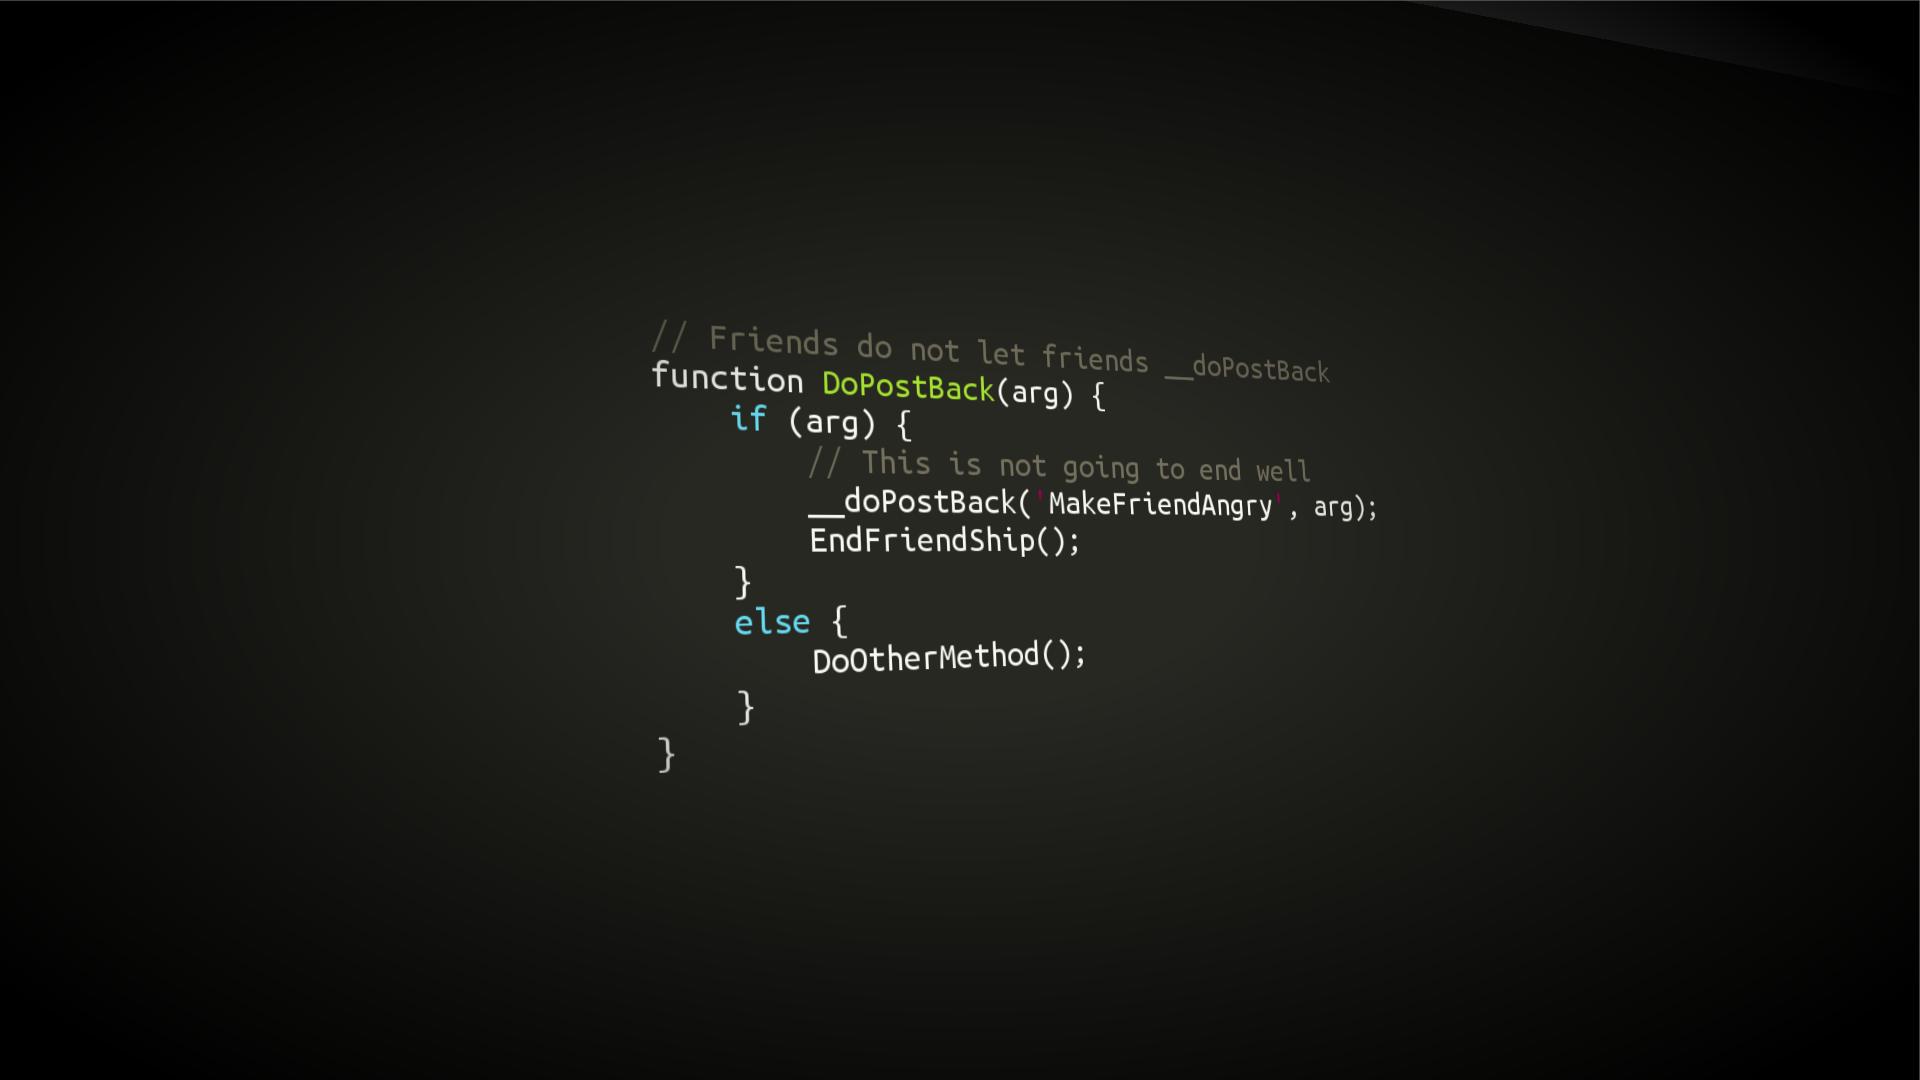 movies syntax highlighting code programming minimalism 1920x1080